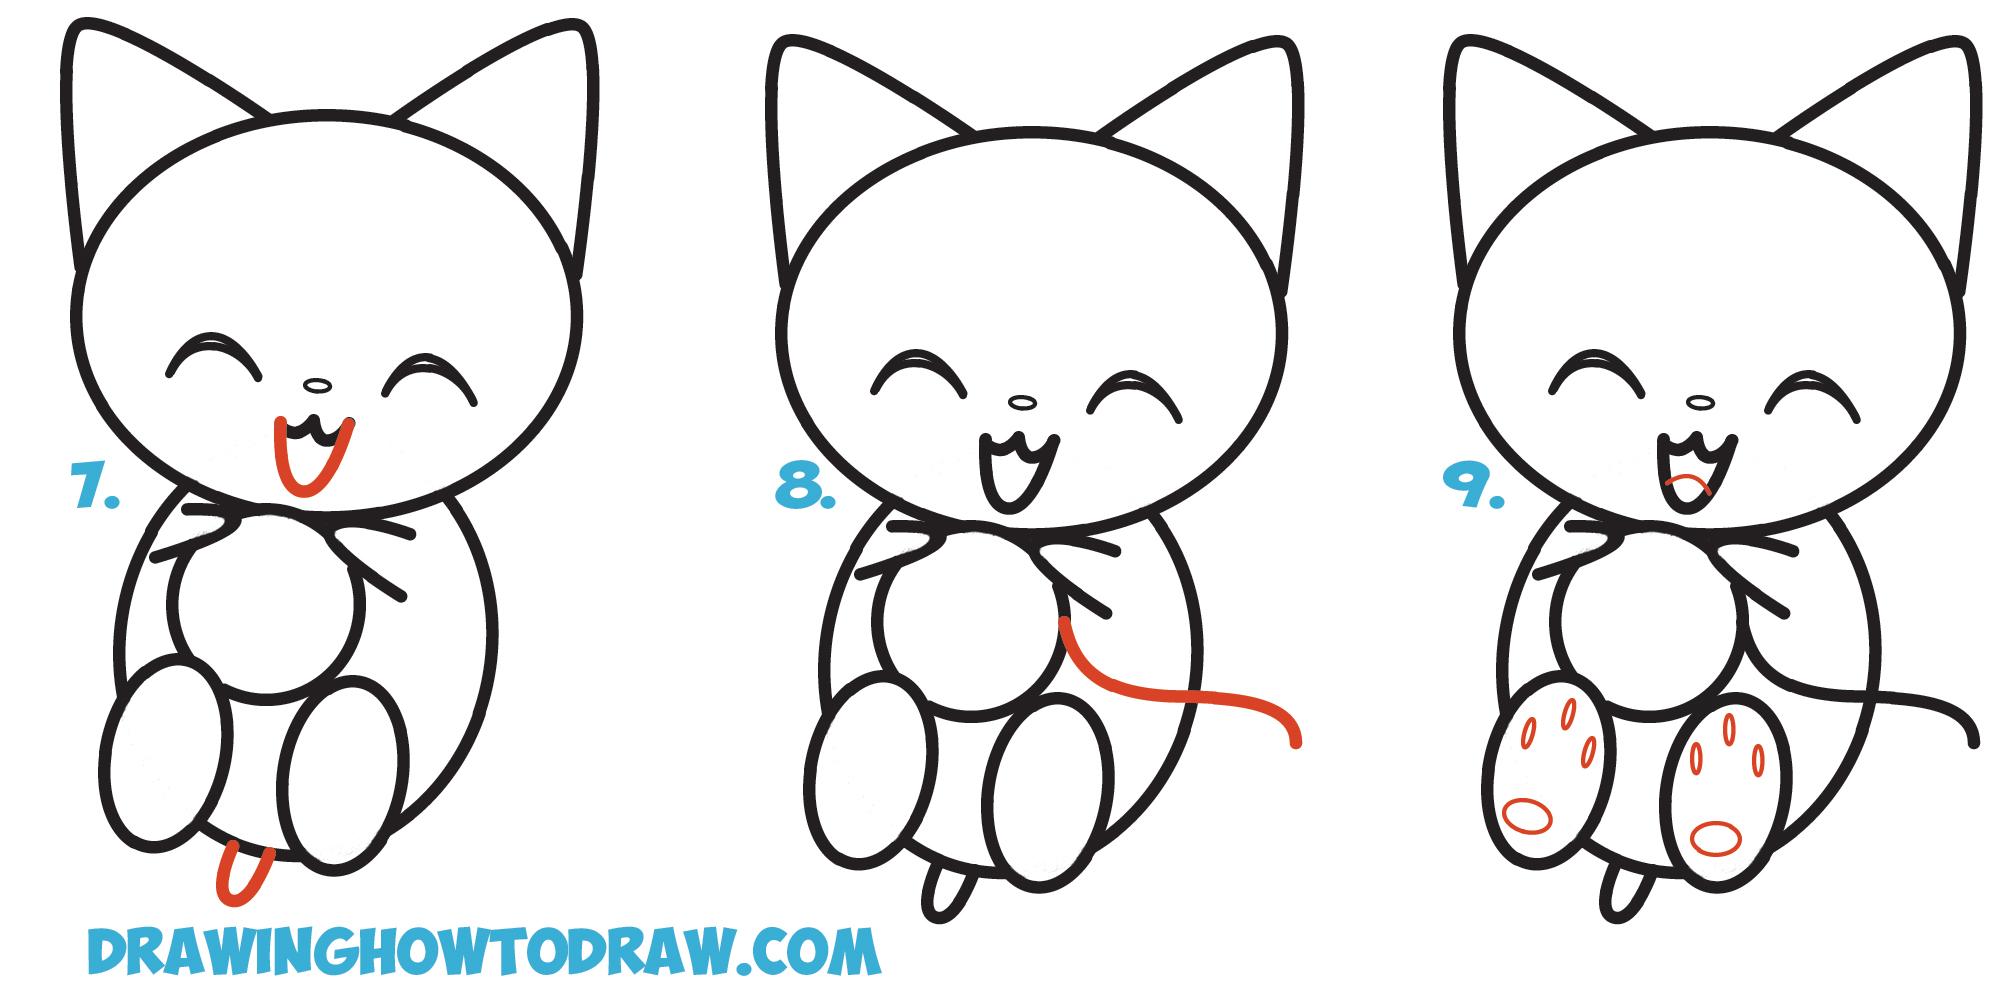 How To Draw A Kawaii Dog Jpg 2004x999 Kawaii Chibi Dogs Drawings